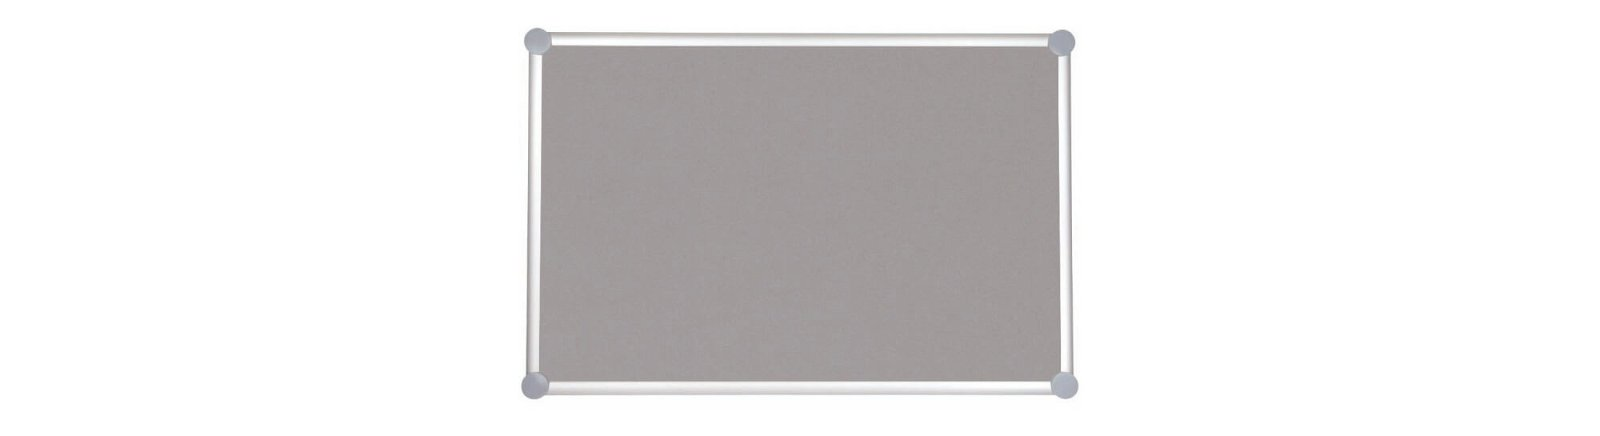 Pinnboard 2000 MAULpro, Textil, 100x150 cm, grau